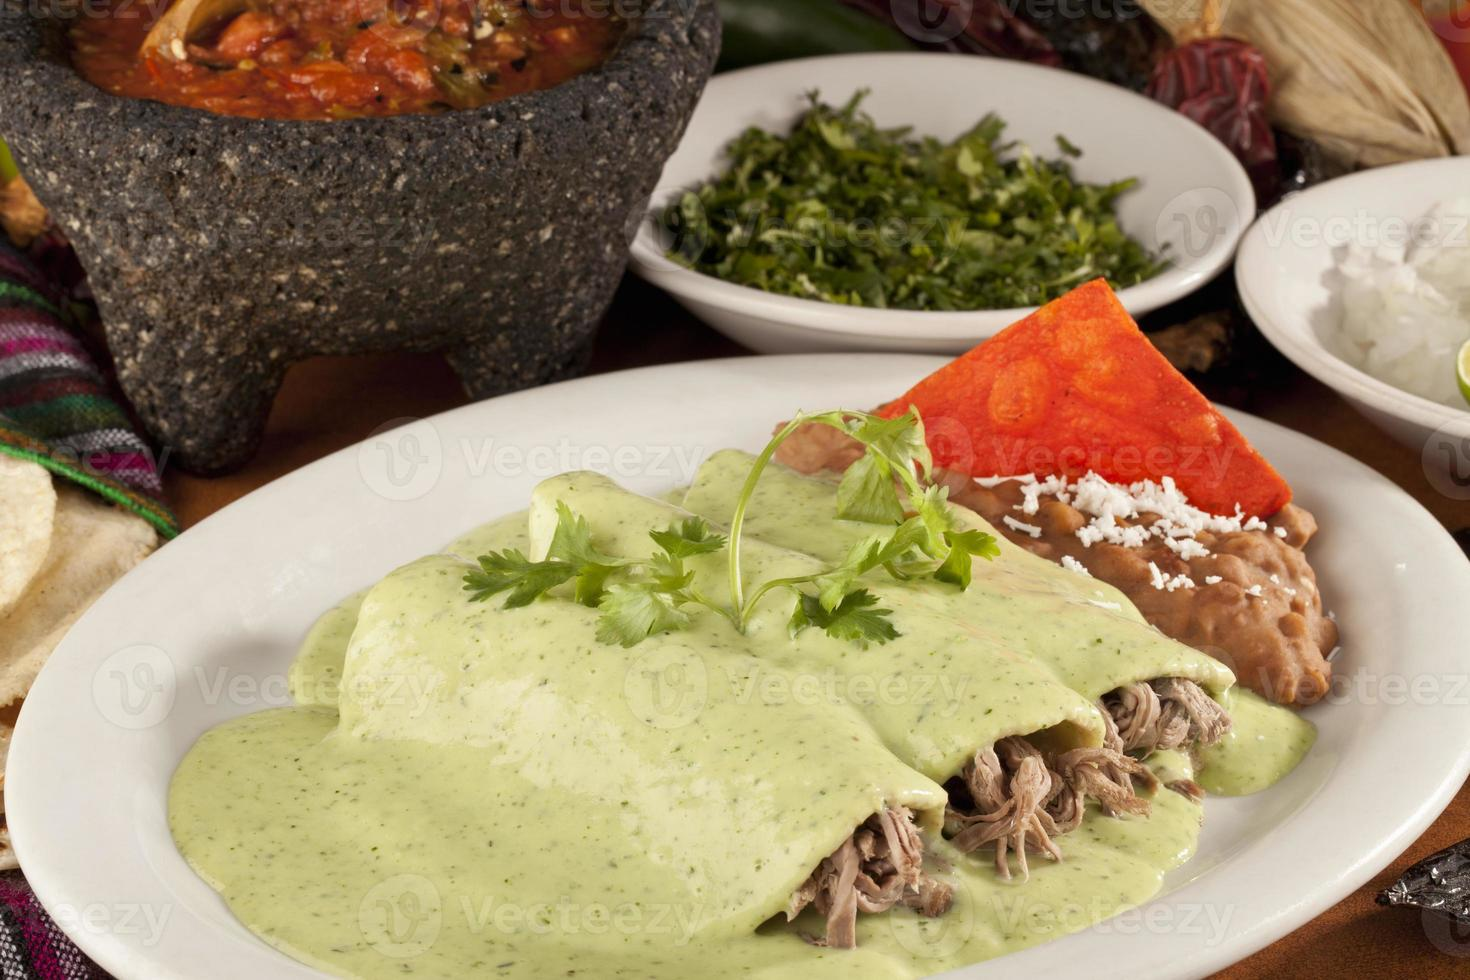 rundvlees en kip Mexicaanse enchiladas foto